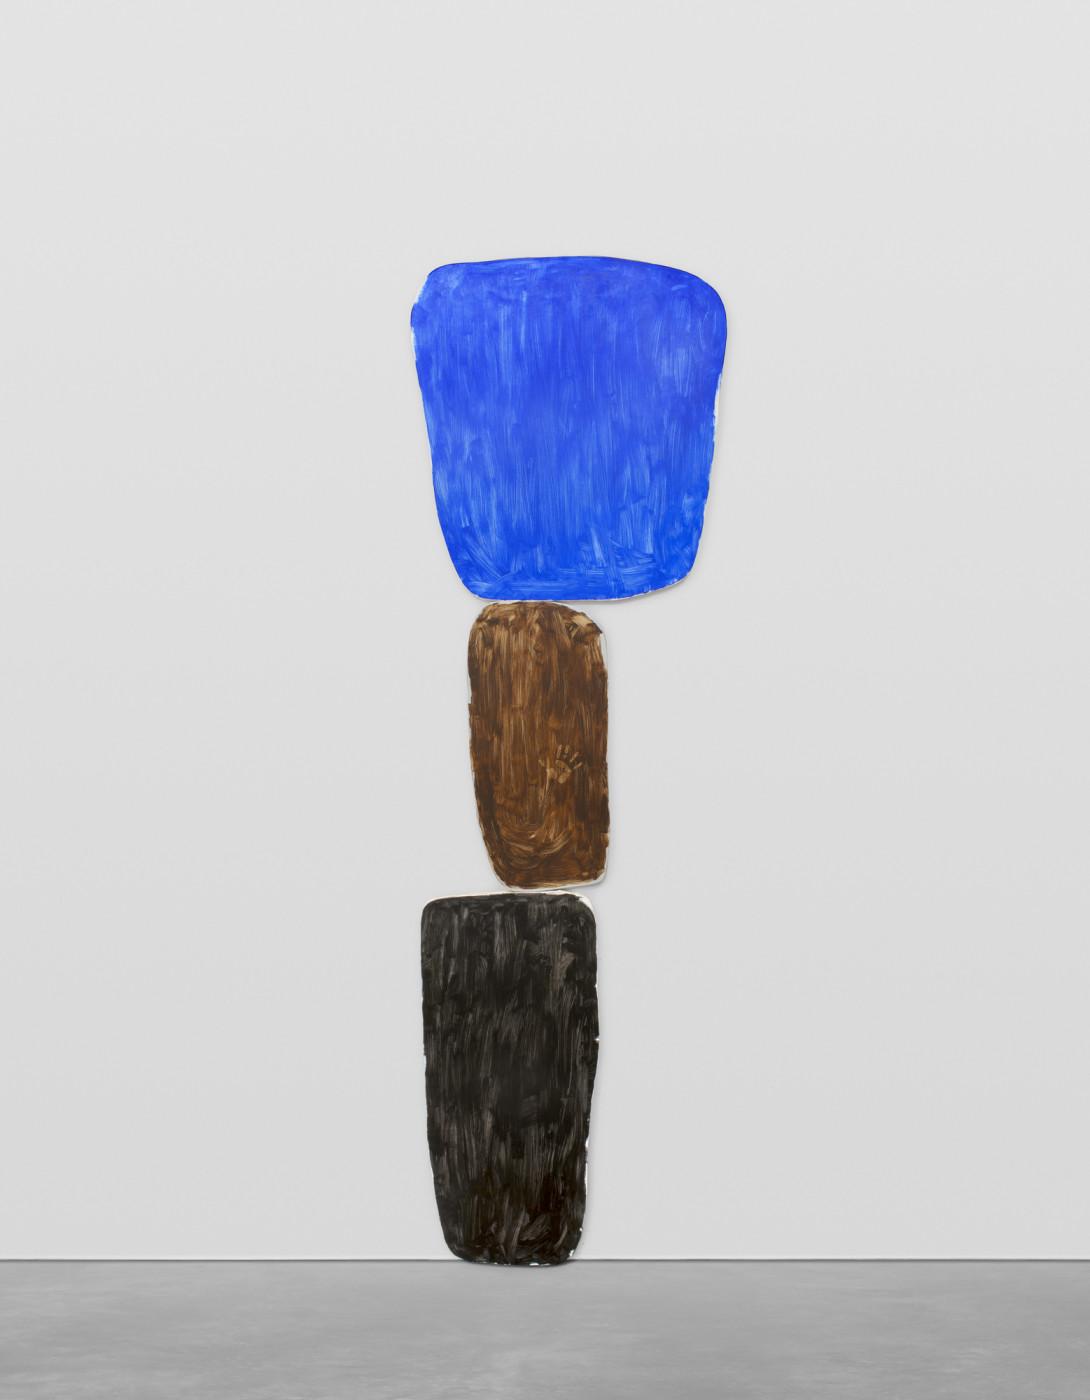 "<div class=""artwork_caption""><div class=""title""><em>vierterjanuarzweitausendundeinundzwanzig</em>, 2021</div><div class=""medium"">oil on canvas, Perspex plaque</div><div class=""dimensions"">overall: 478 x 148.1 x 5.1 cm / 188 ¼ x 58 ¼ x 2 in<br />top canvas: 155 x 144 x 5 cm<br />center canvas: 137.5 x 65 x 5 cm<br />bottom canvas: 193 x 85.5 x 5 cm</div></div><div class=""link""><span class=""website_contact_form"" data-contact-form-details=""vierterjanuarzweitausendundeinundzwanzig, 2021  oil on canvas, Perspex plaque  overall: 478 x 148.1 x 5.1 cm / 188 ¼ x 58 ¼ x 2 in top canvas: 155 x 144 x 5 cm center canvas: 137.5 x 65 x 5 cm bottom canvas: 193 x 85.5 x 5 cm"" data-contact-form-image=""https://artlogic-res.cloudinary.com/w_200,h_200,c_fill,f_auto,fl_lossy/ws-sadiecoles/usr/exhibitions/images/exhibitions/852/hq24-ur17036p-image.jpg"">Enquire</span></div>"